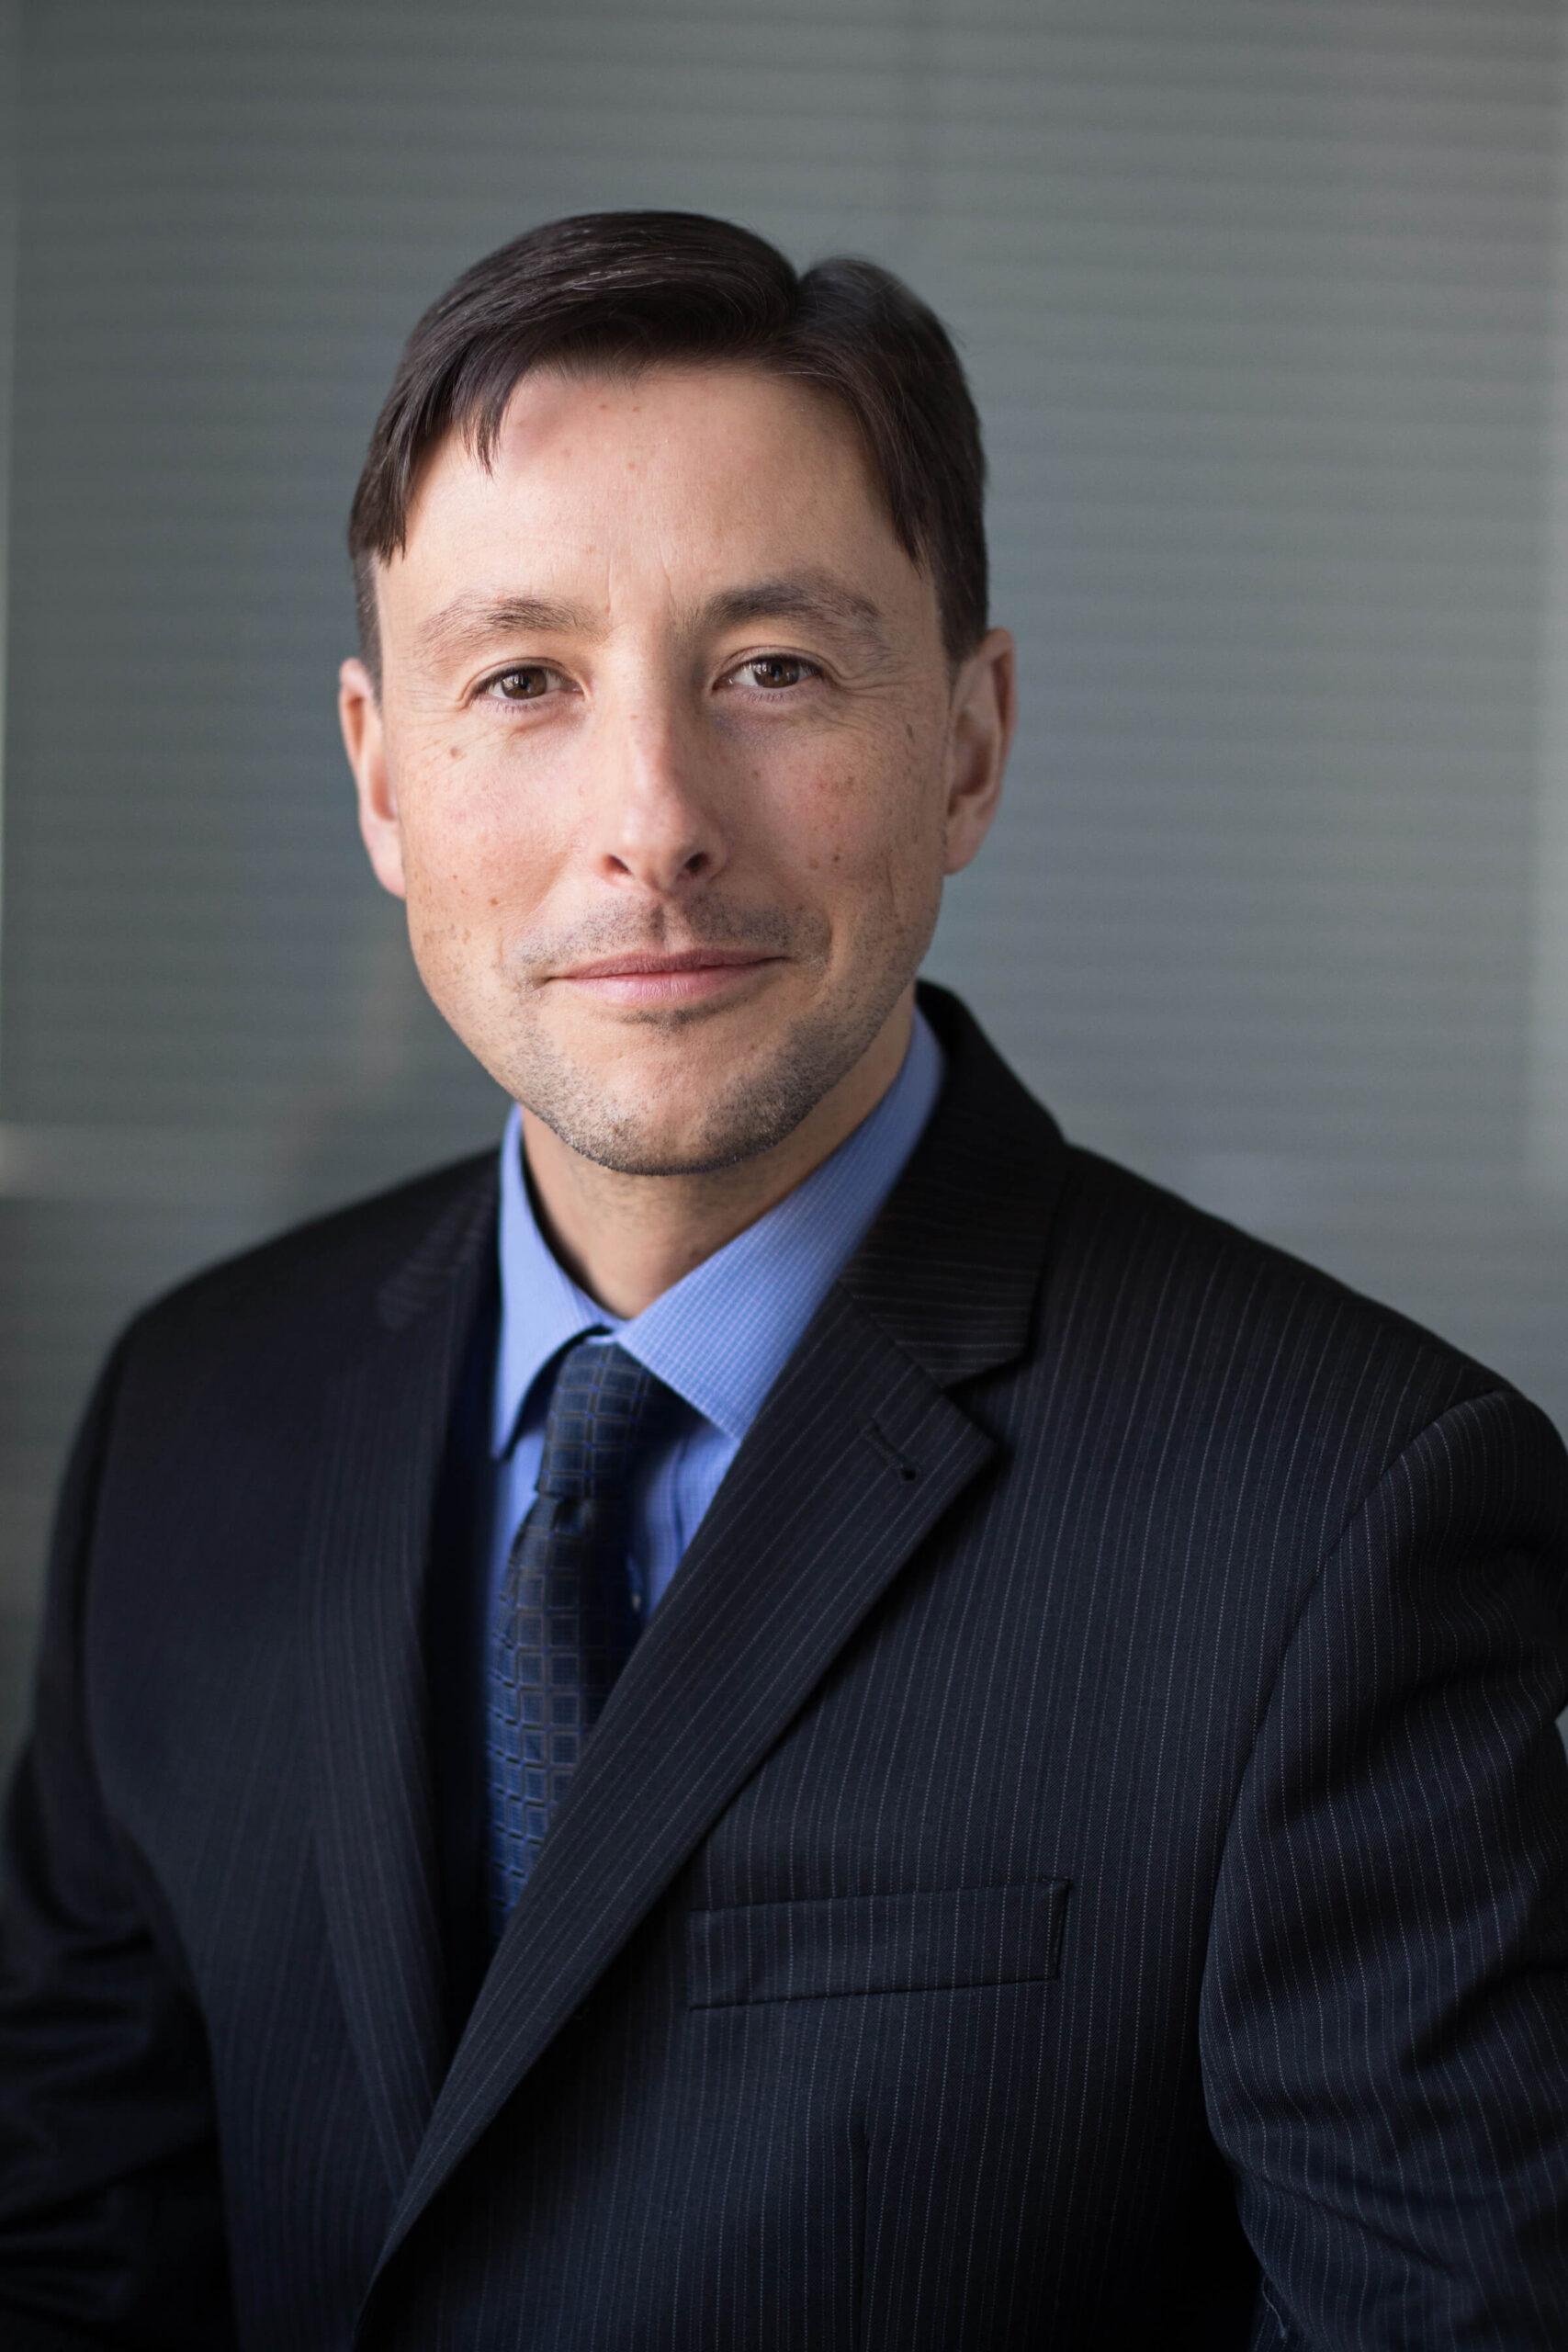 Philip Hancock